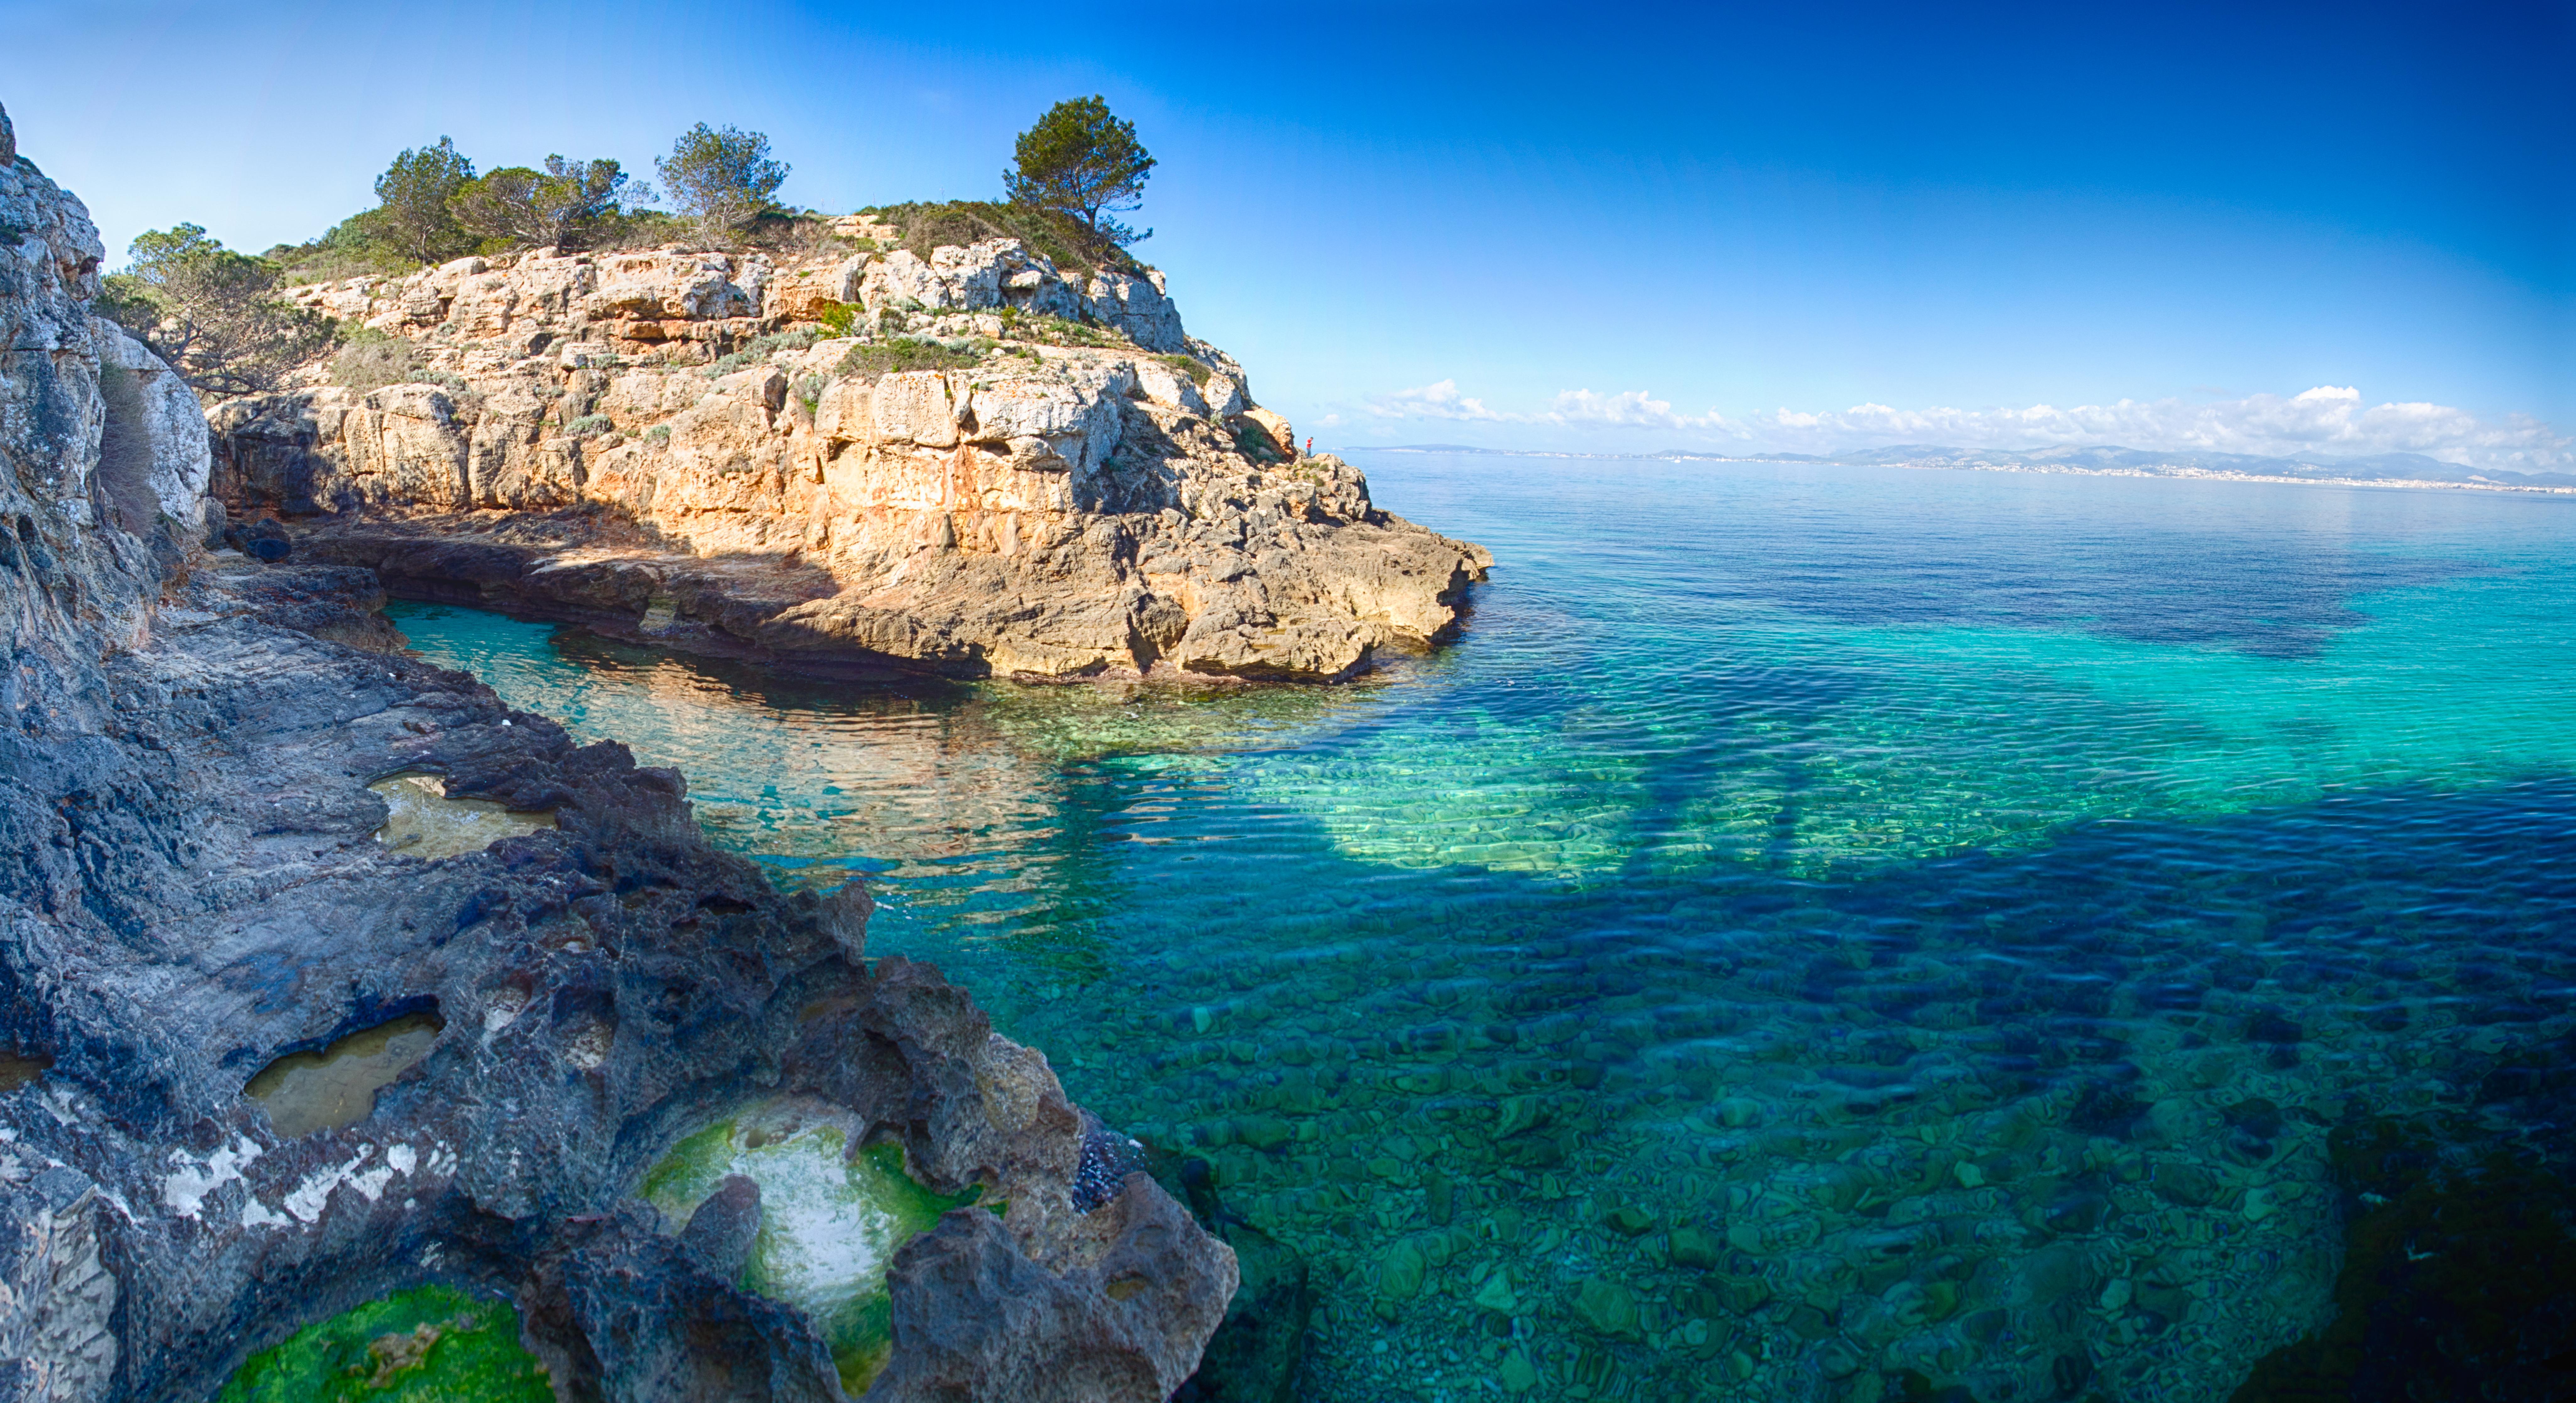 Summer Program - Marine Biology | CIEE High School Summer Abroad in Palma De Mallorca, Spain - Marine Science & Field Work